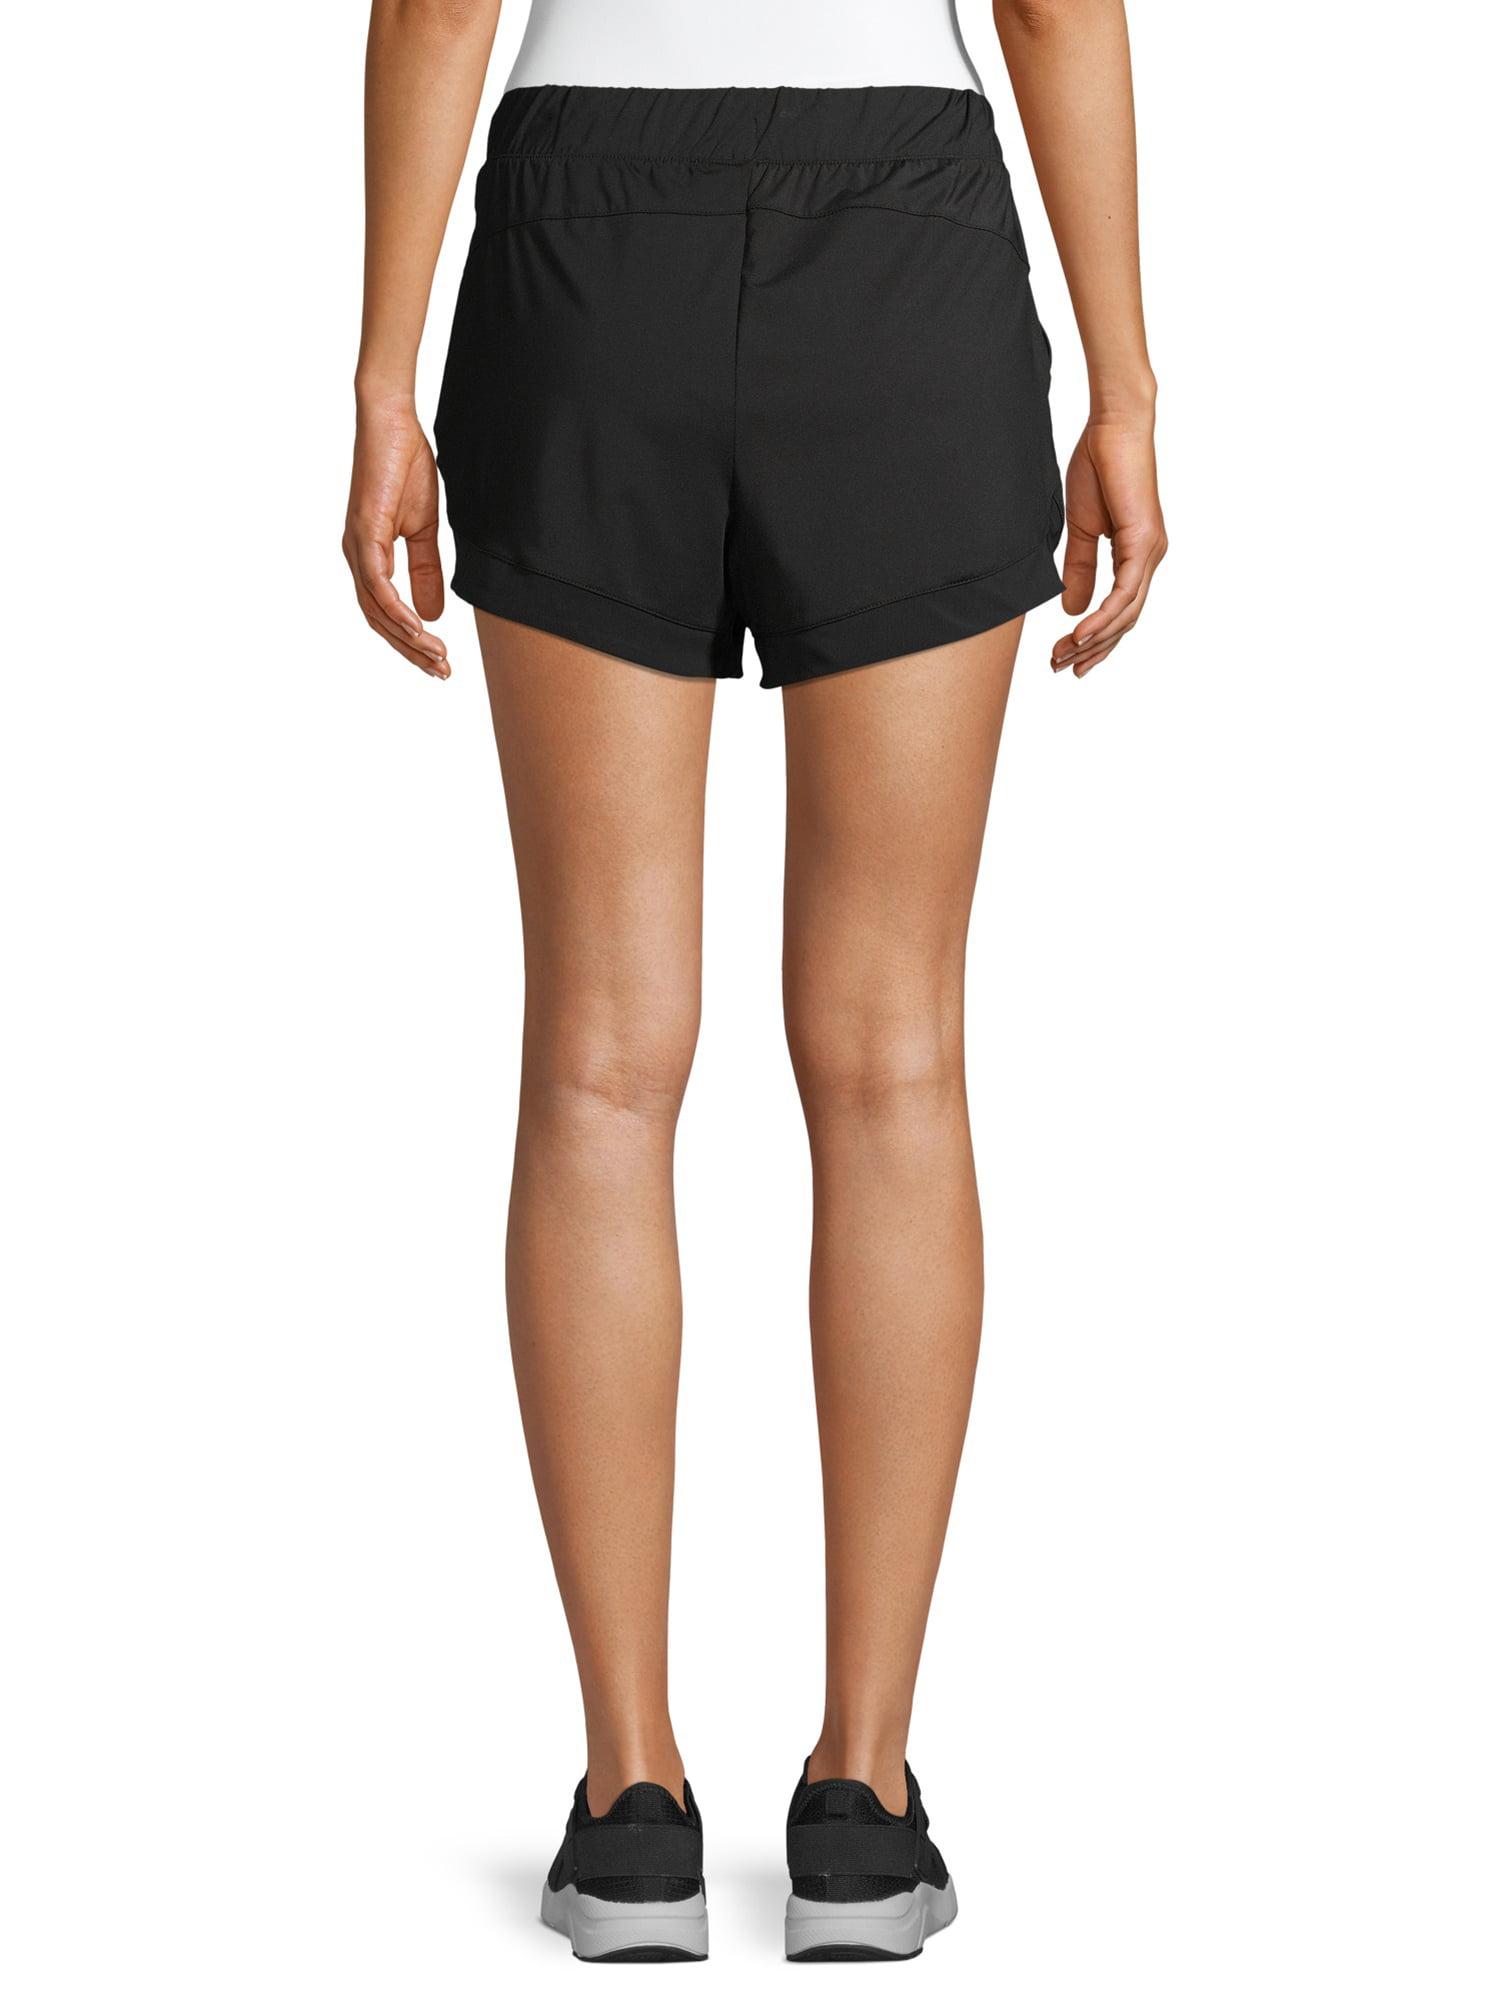 Avia Avia Women S Active Running Shorts Walmart Com Walmart Com [ 2000 x 1500 Pixel ]